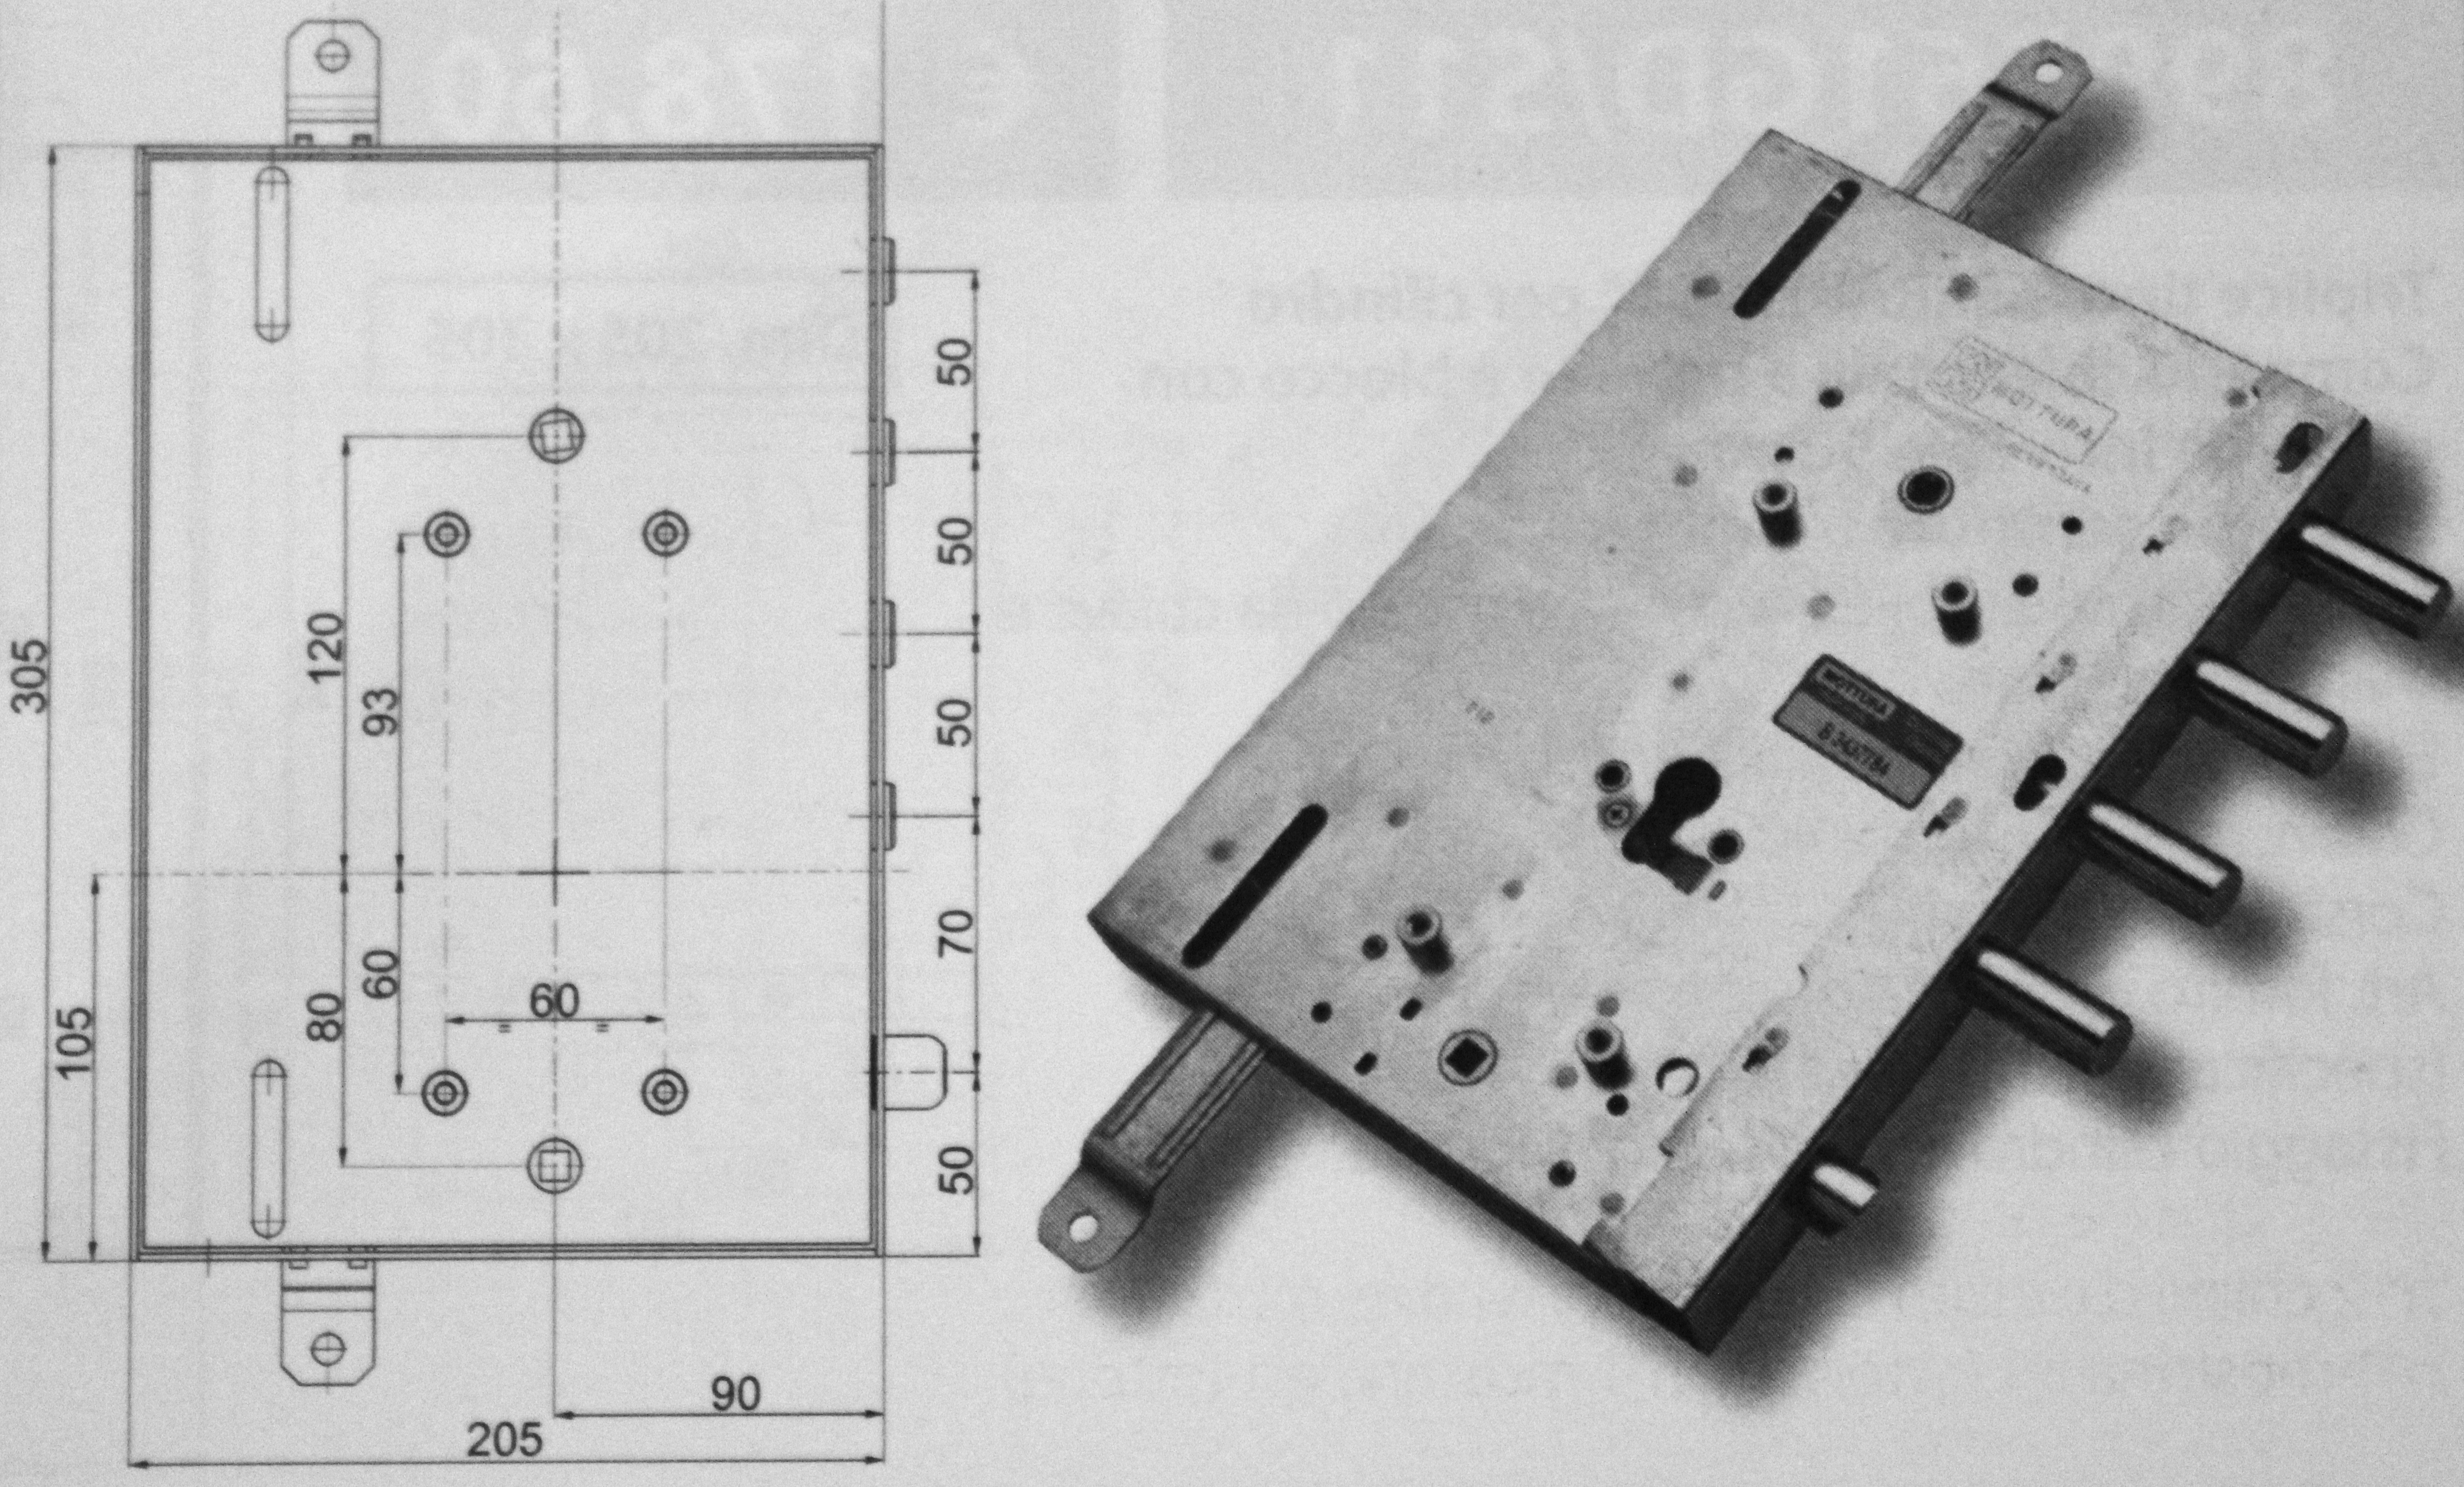 Gardesa serrablinda serrature mottura 898561gds15 - Serrature mottura sostituzione cilindro ...